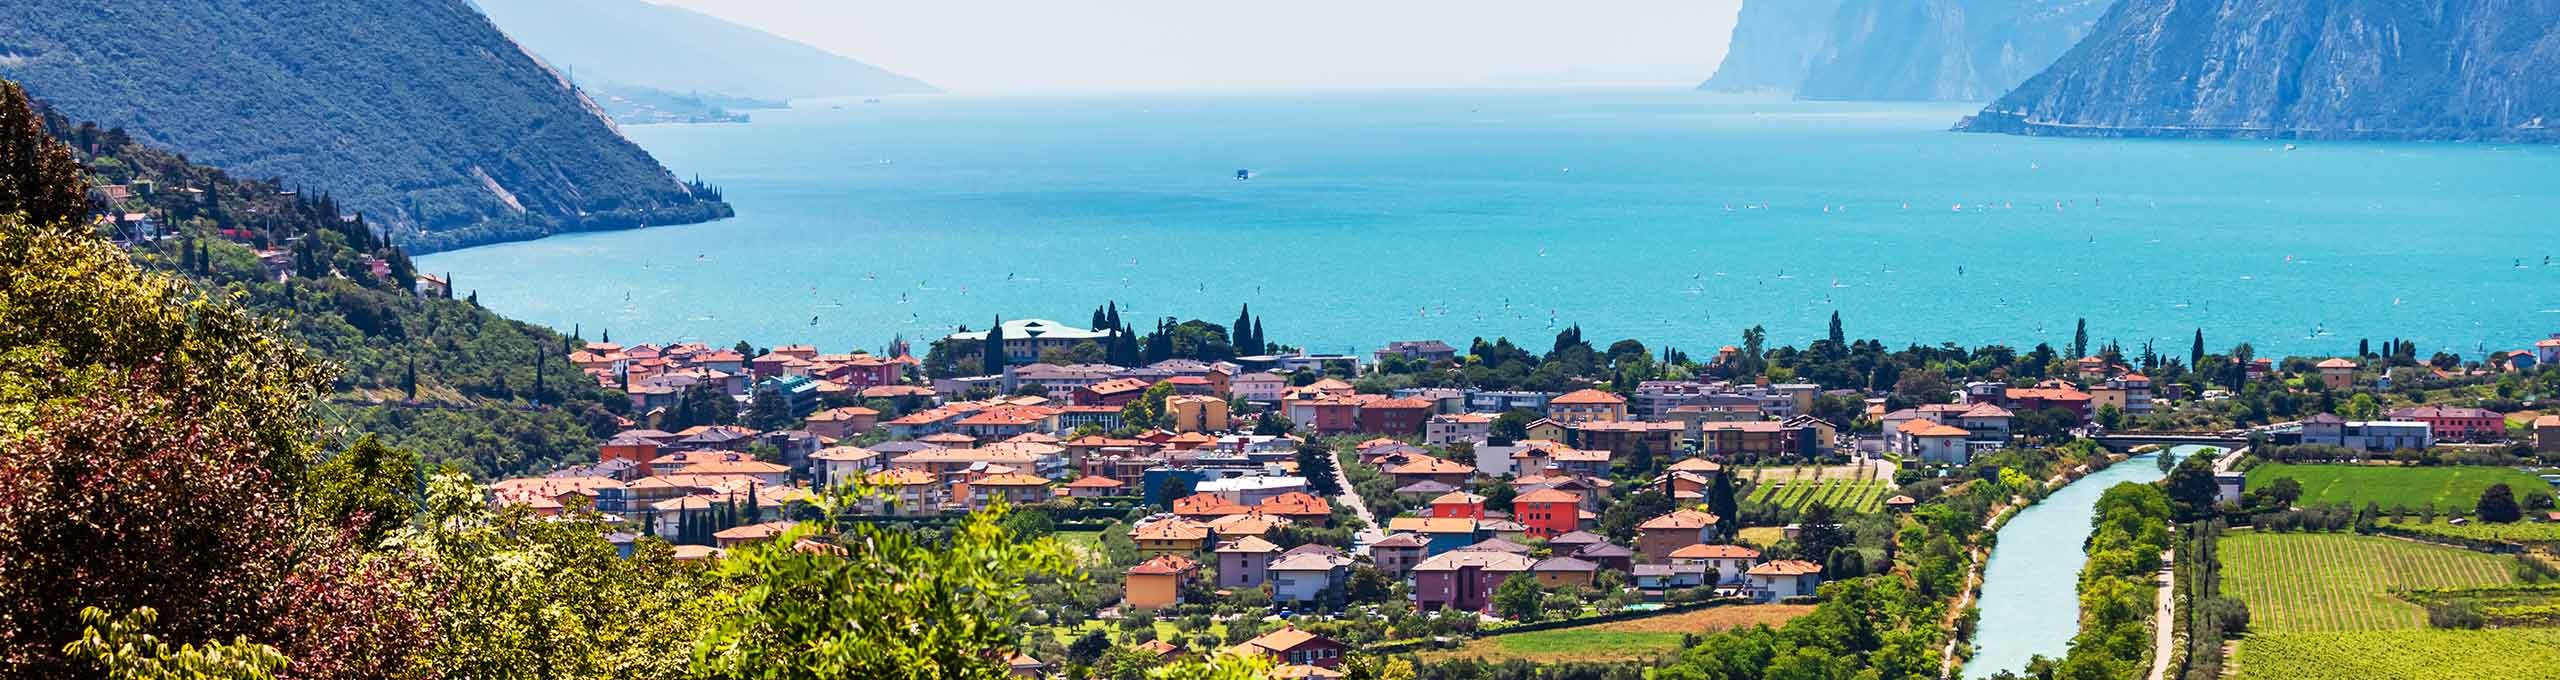 Nago Torbole, Lago di Garda